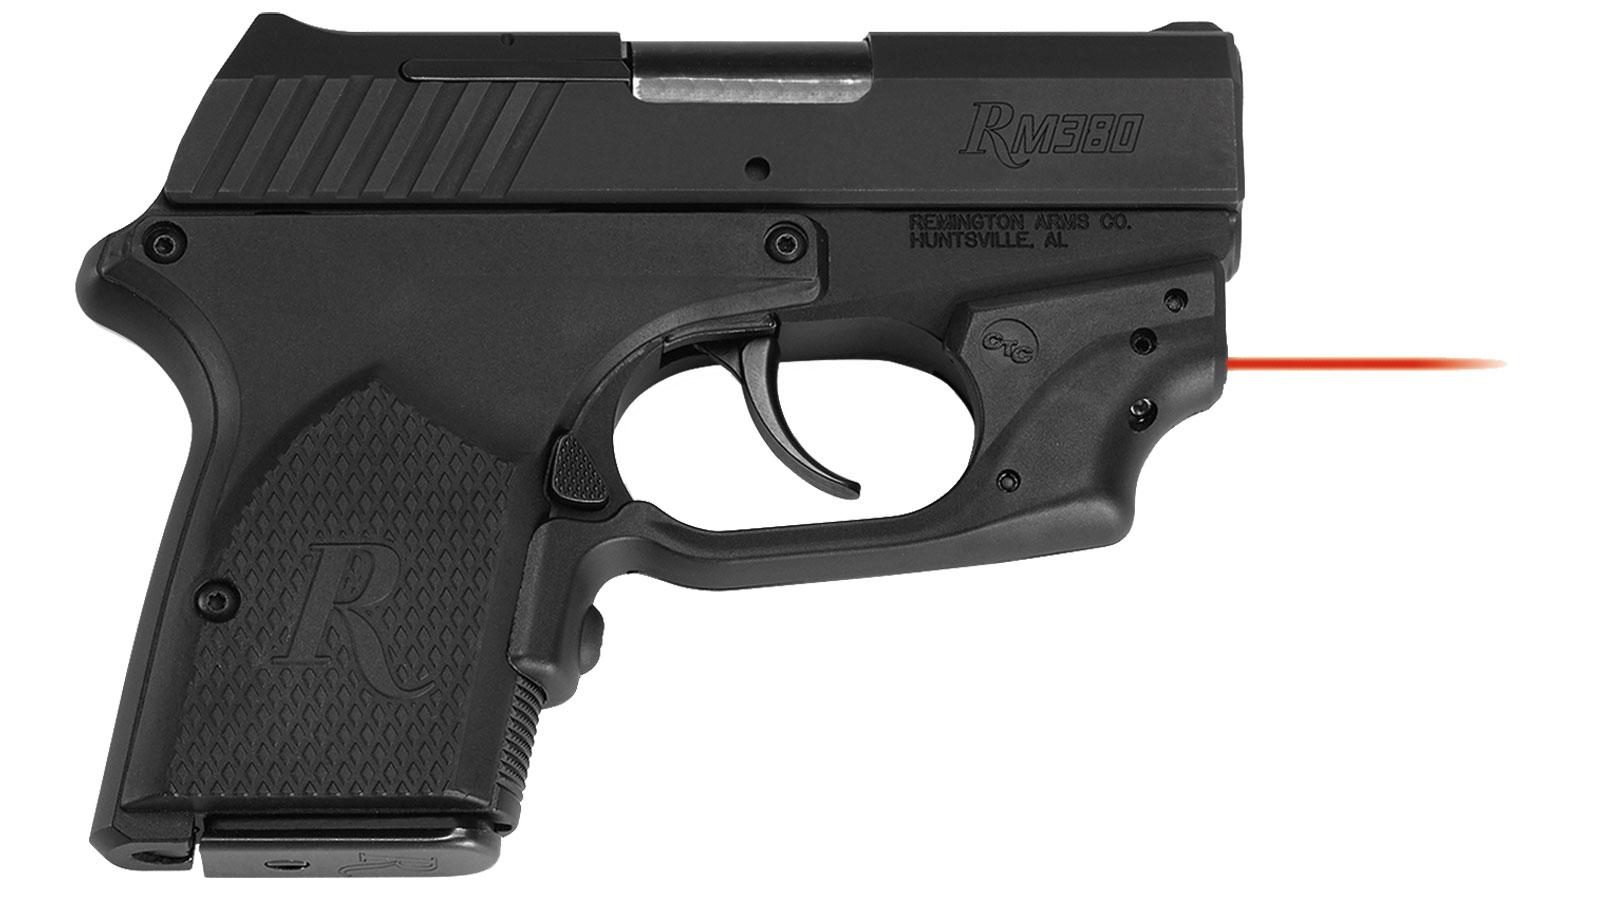 Crimson Trace LG479 Laserguard  Red Laser Remington RM380 Trigger Guard Black